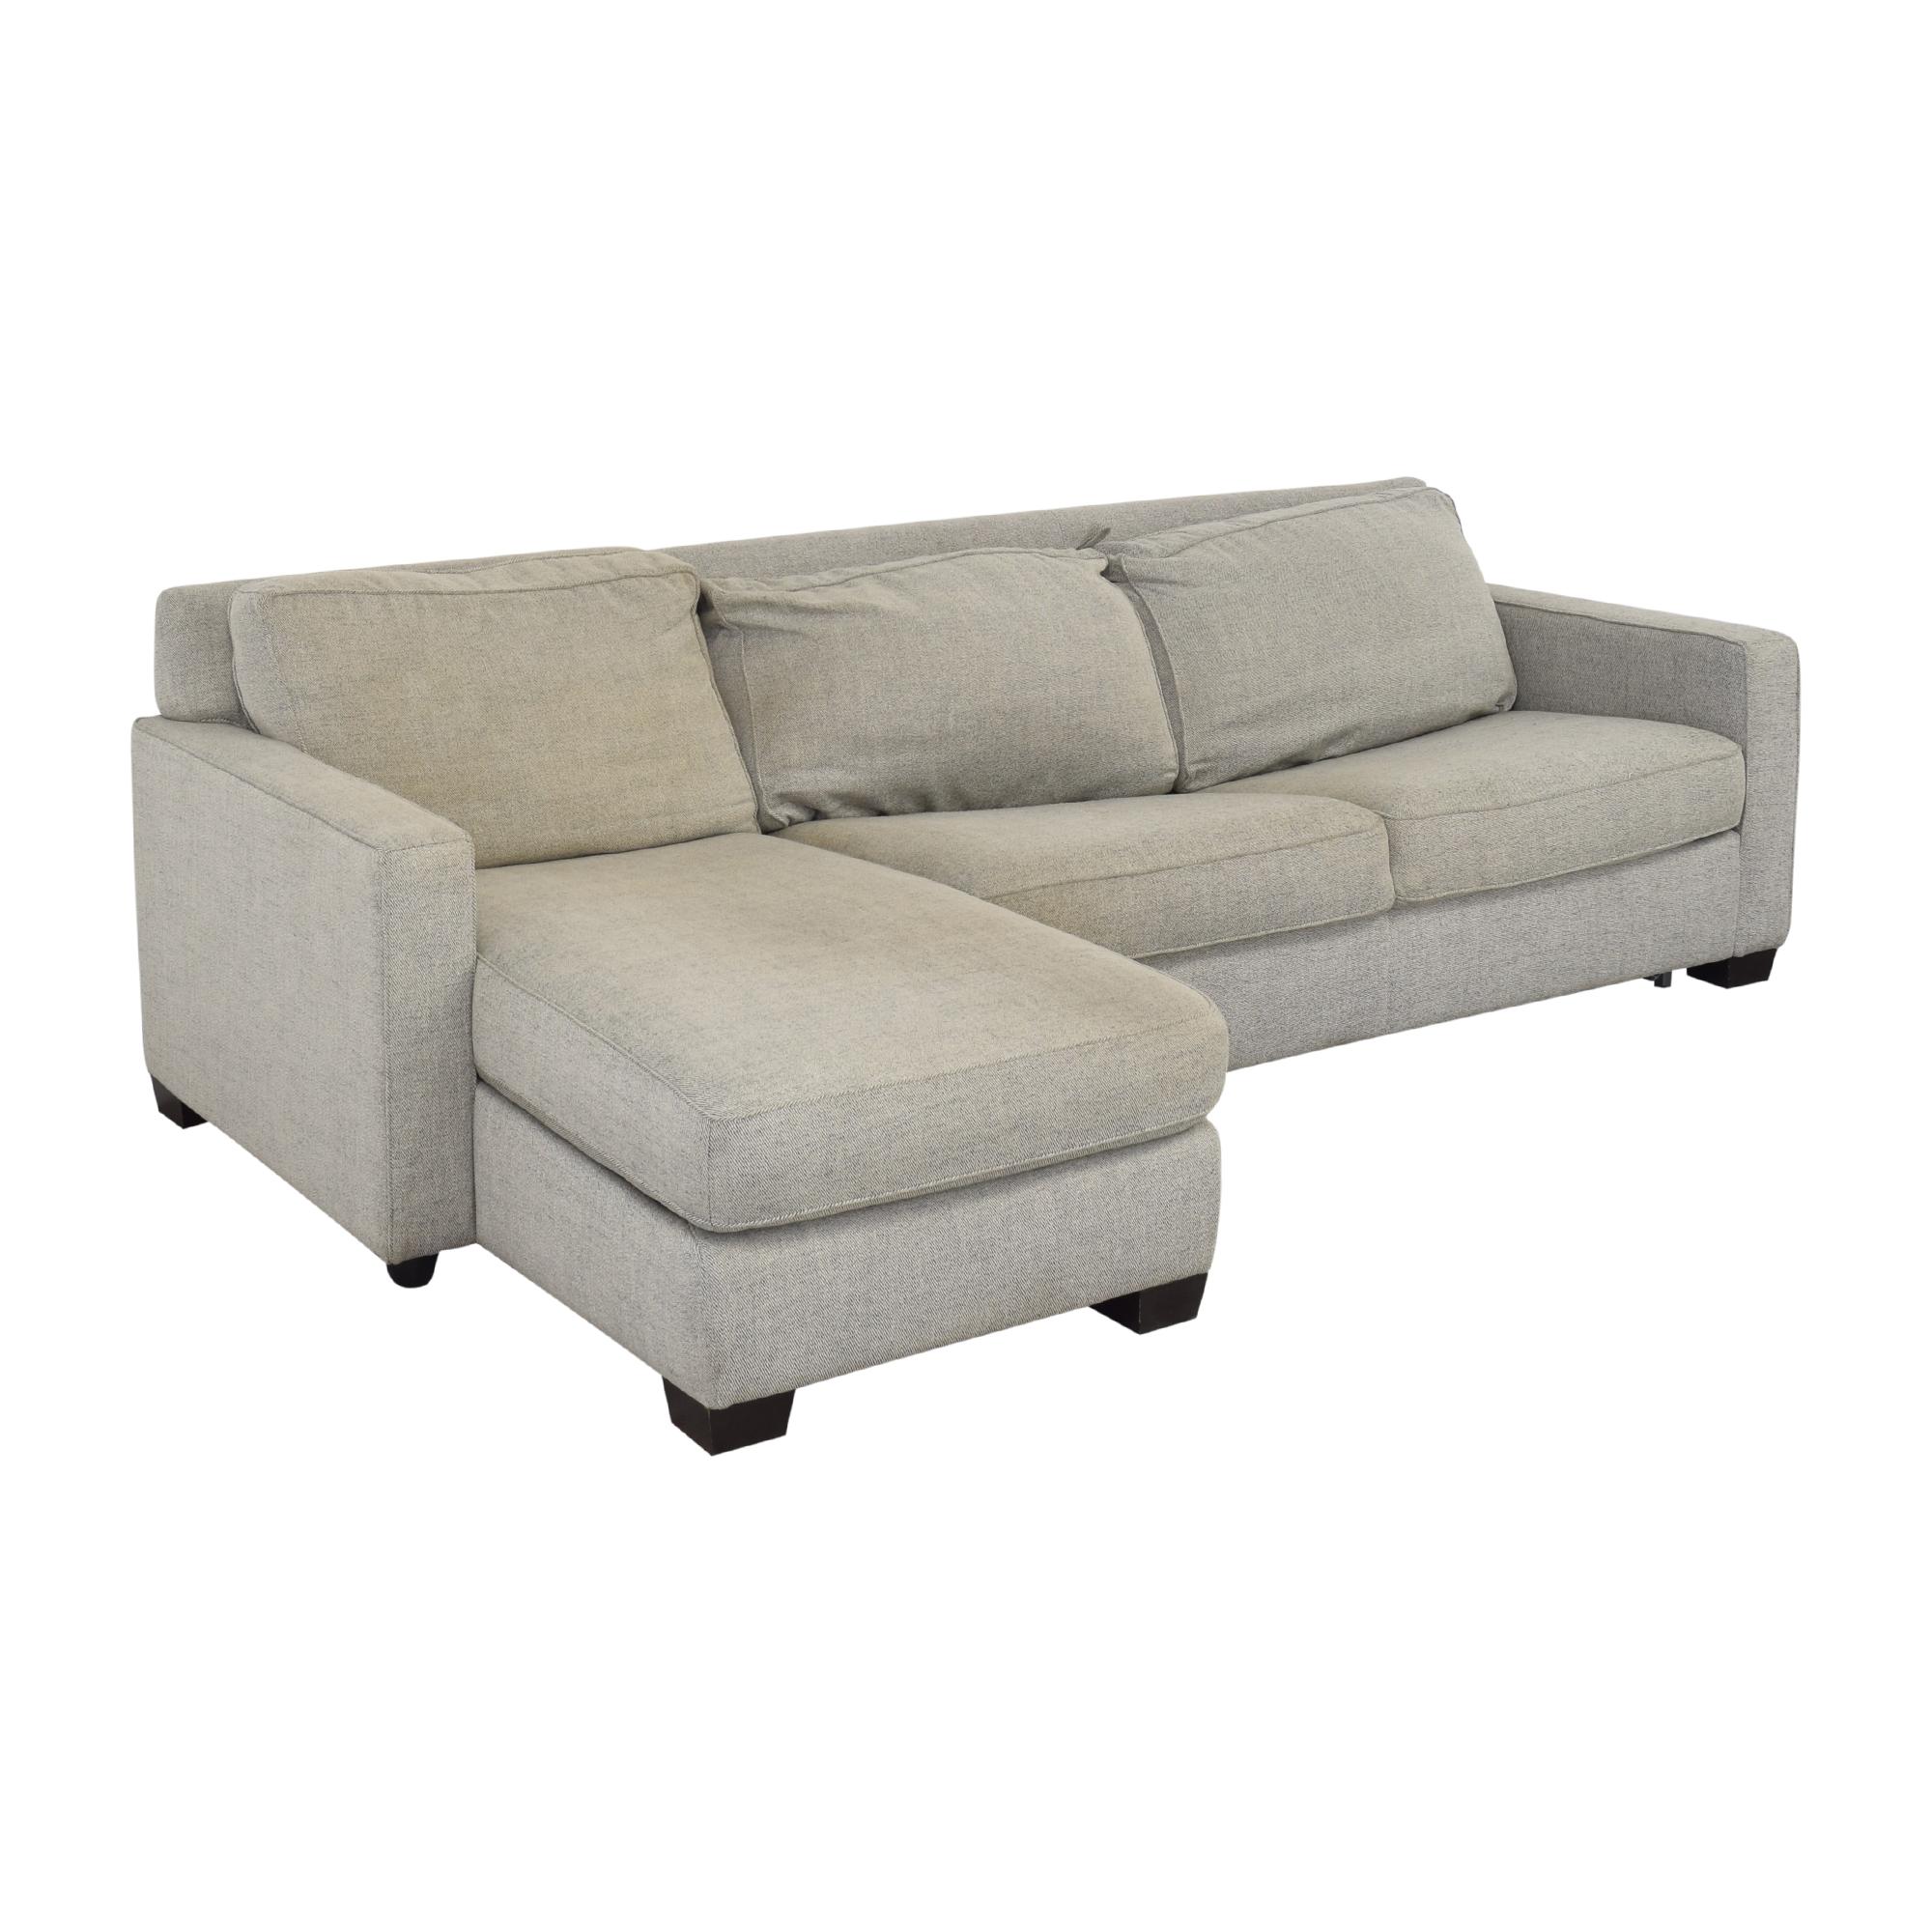 shop West Elm West Elm Henry 2-Piece Full Sleeper Storage Sofa online